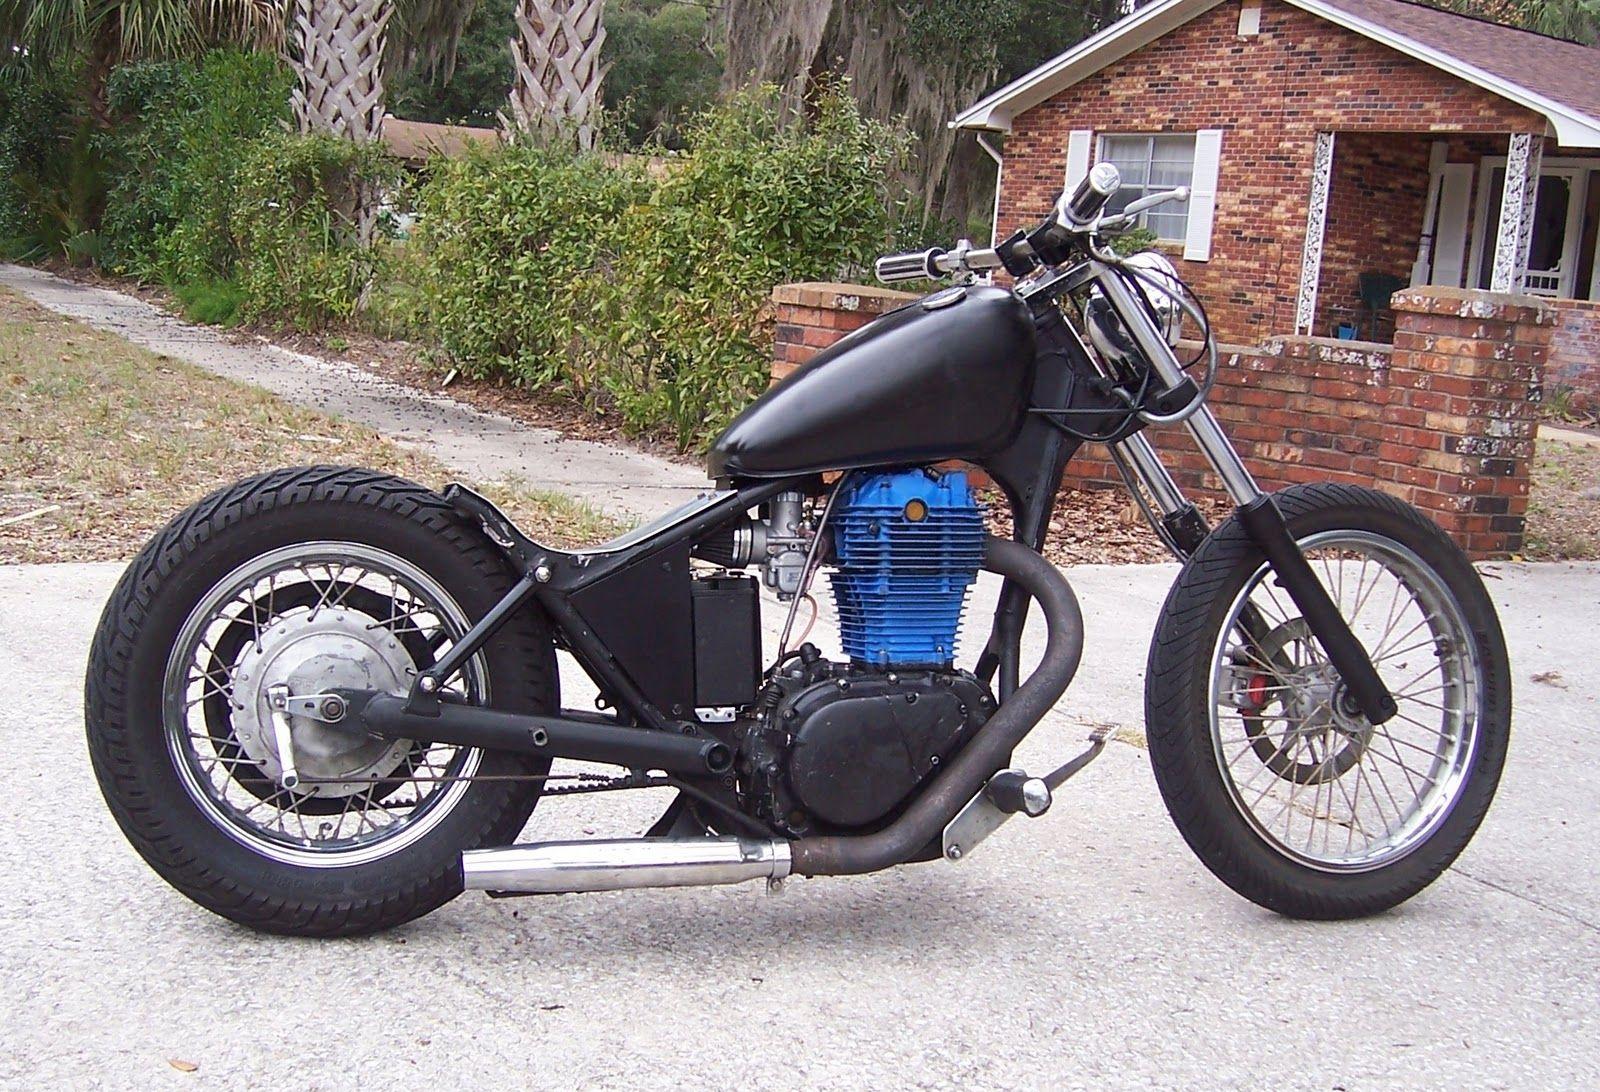 Cool Bikes Suzuki Ls650 Savage Honda Bobber Bobber Bikes Bobber Motorcycle